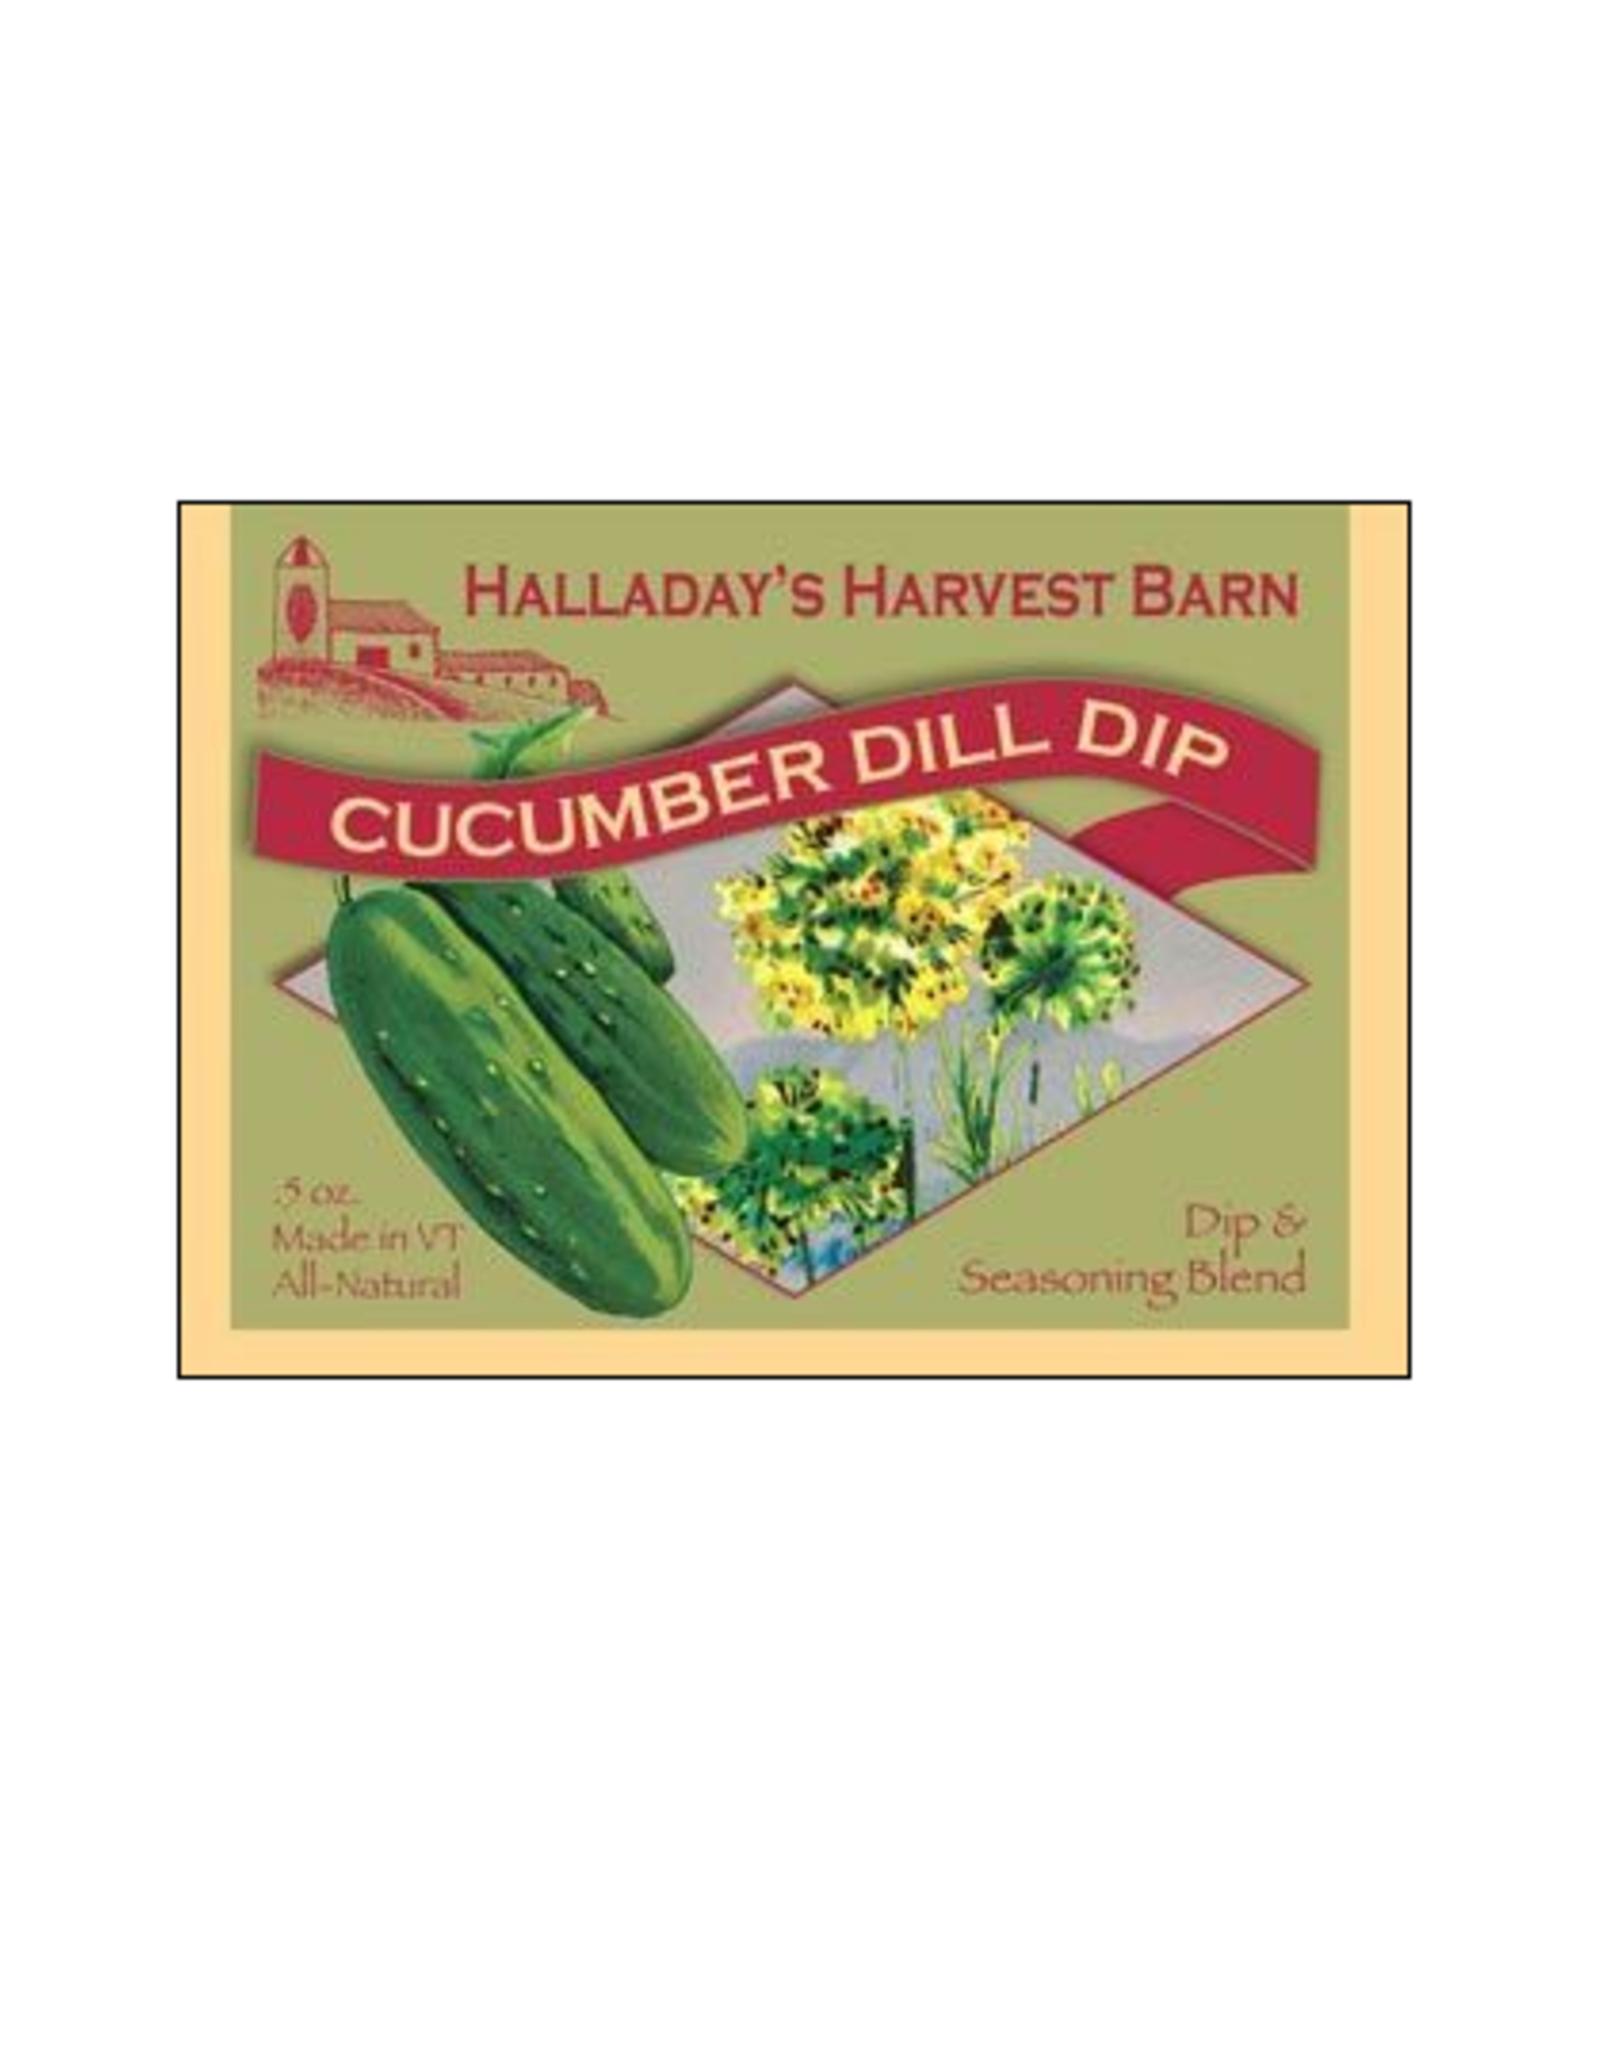 Halladay's Harvest Barn Cucumber Dill Dip